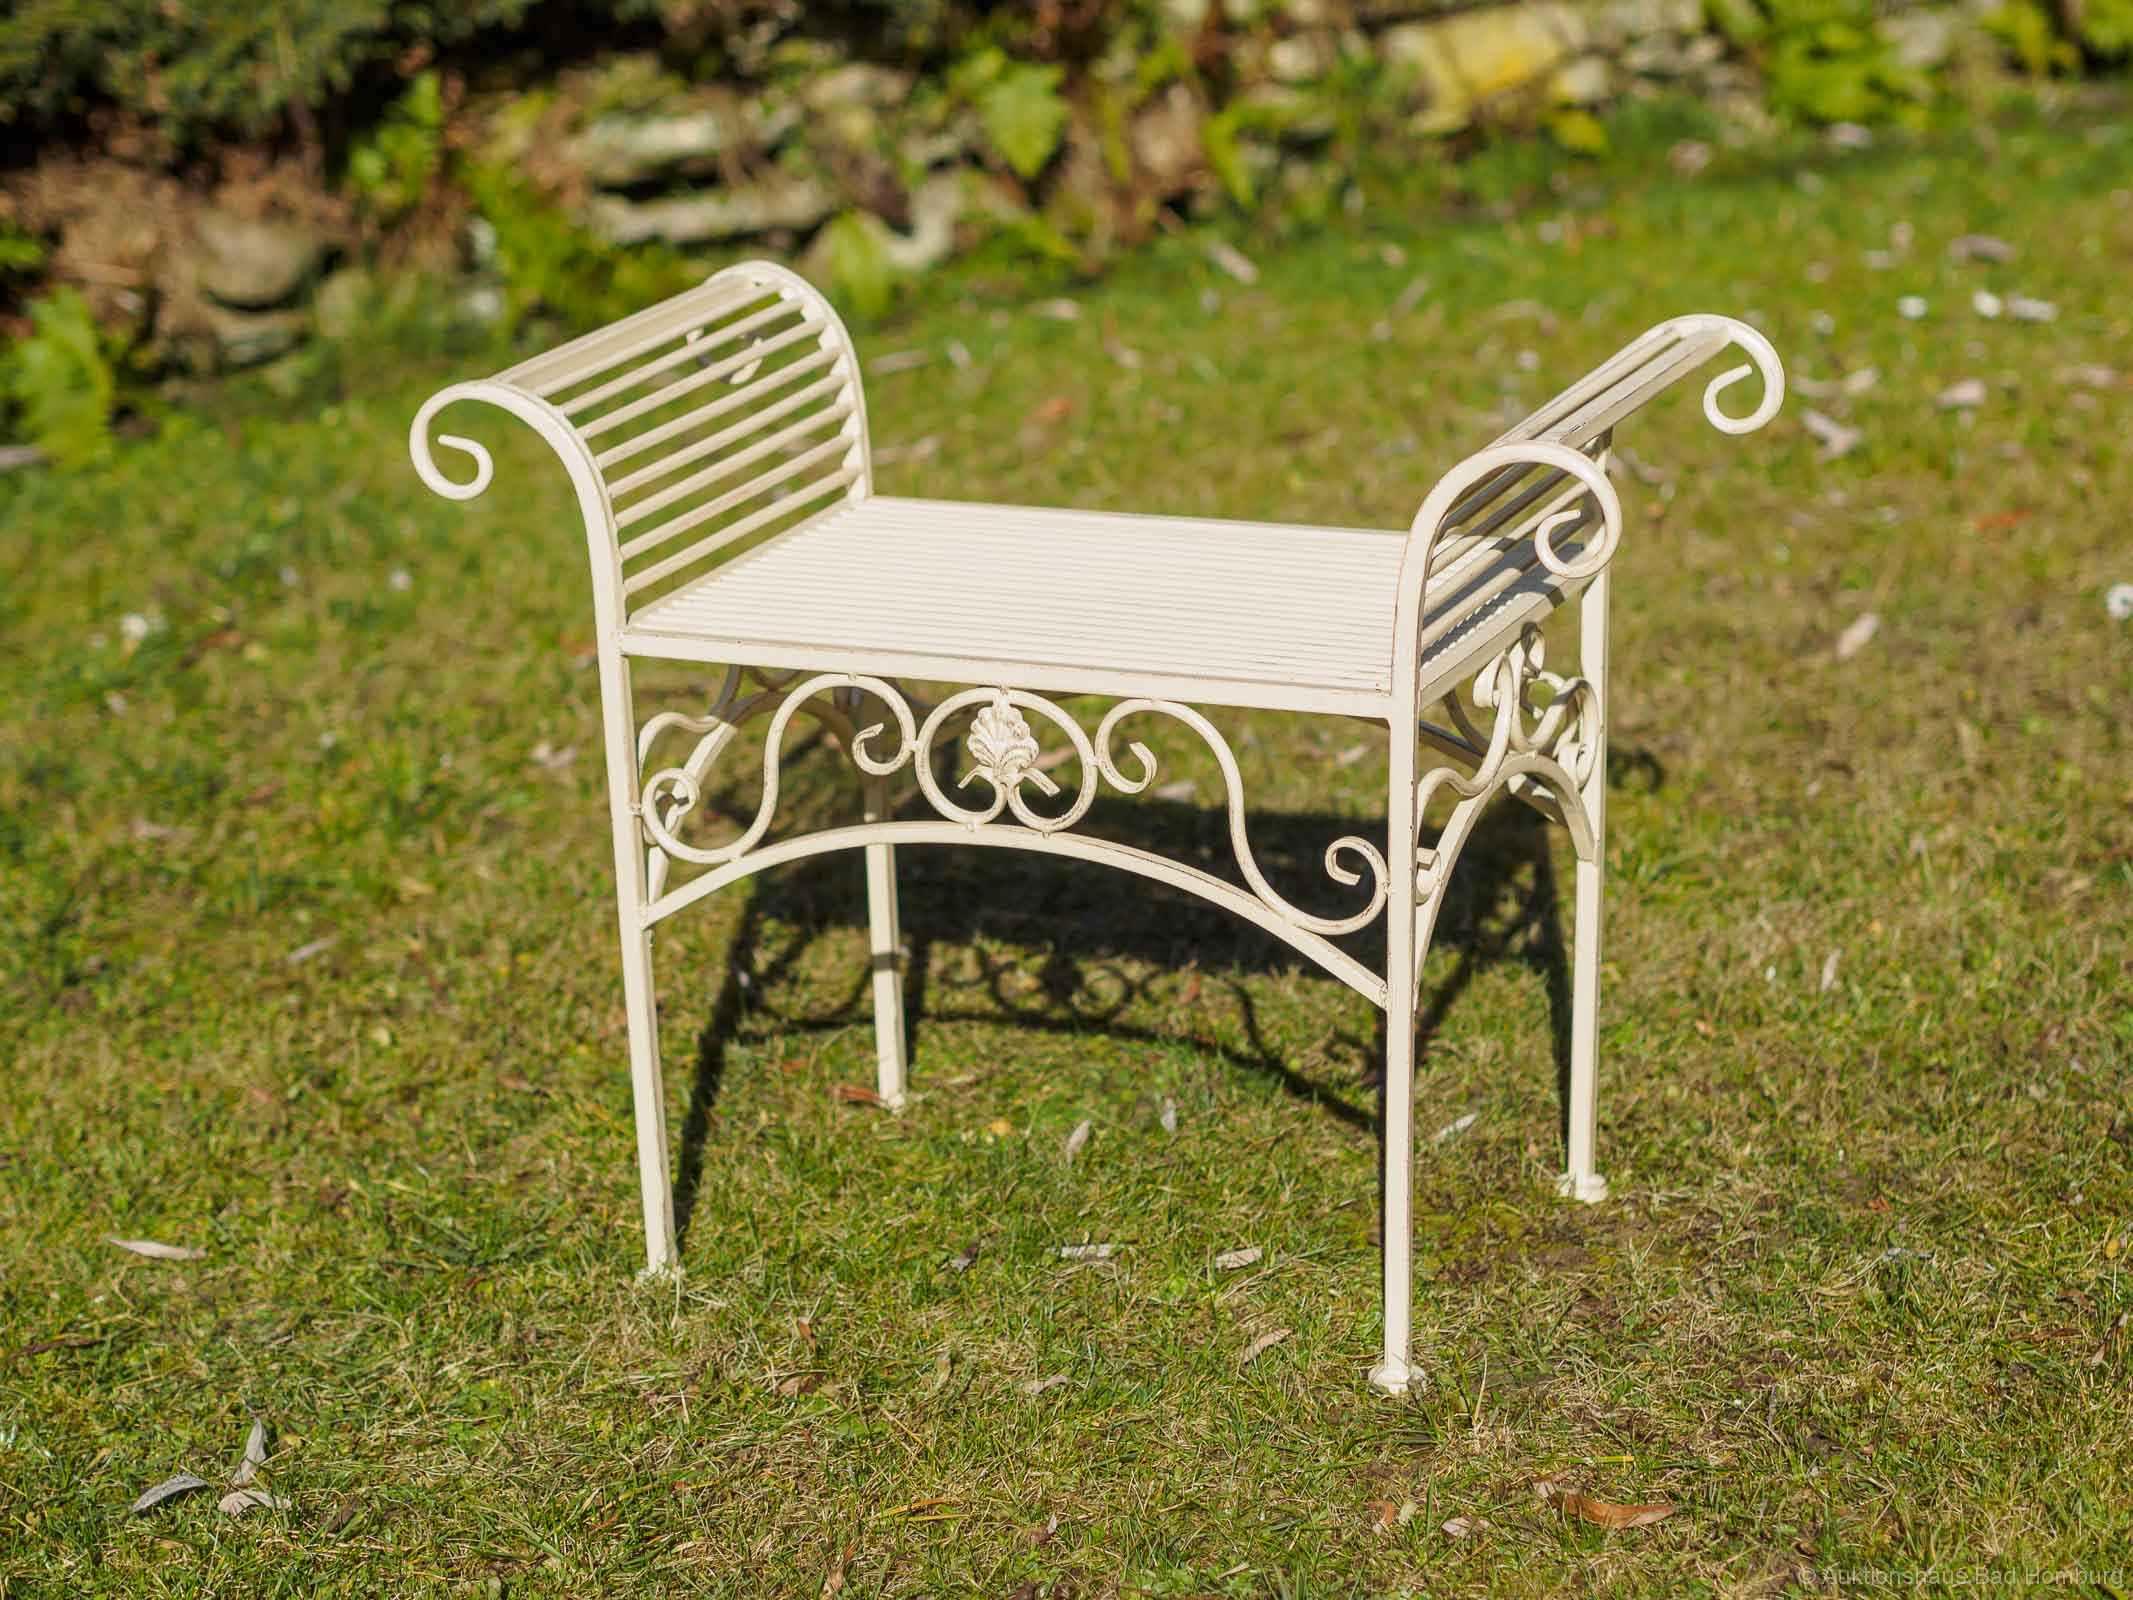 gartenbank eisen metall antik stil garten bank gartenm bel creme weiss 70cm aubaho. Black Bedroom Furniture Sets. Home Design Ideas